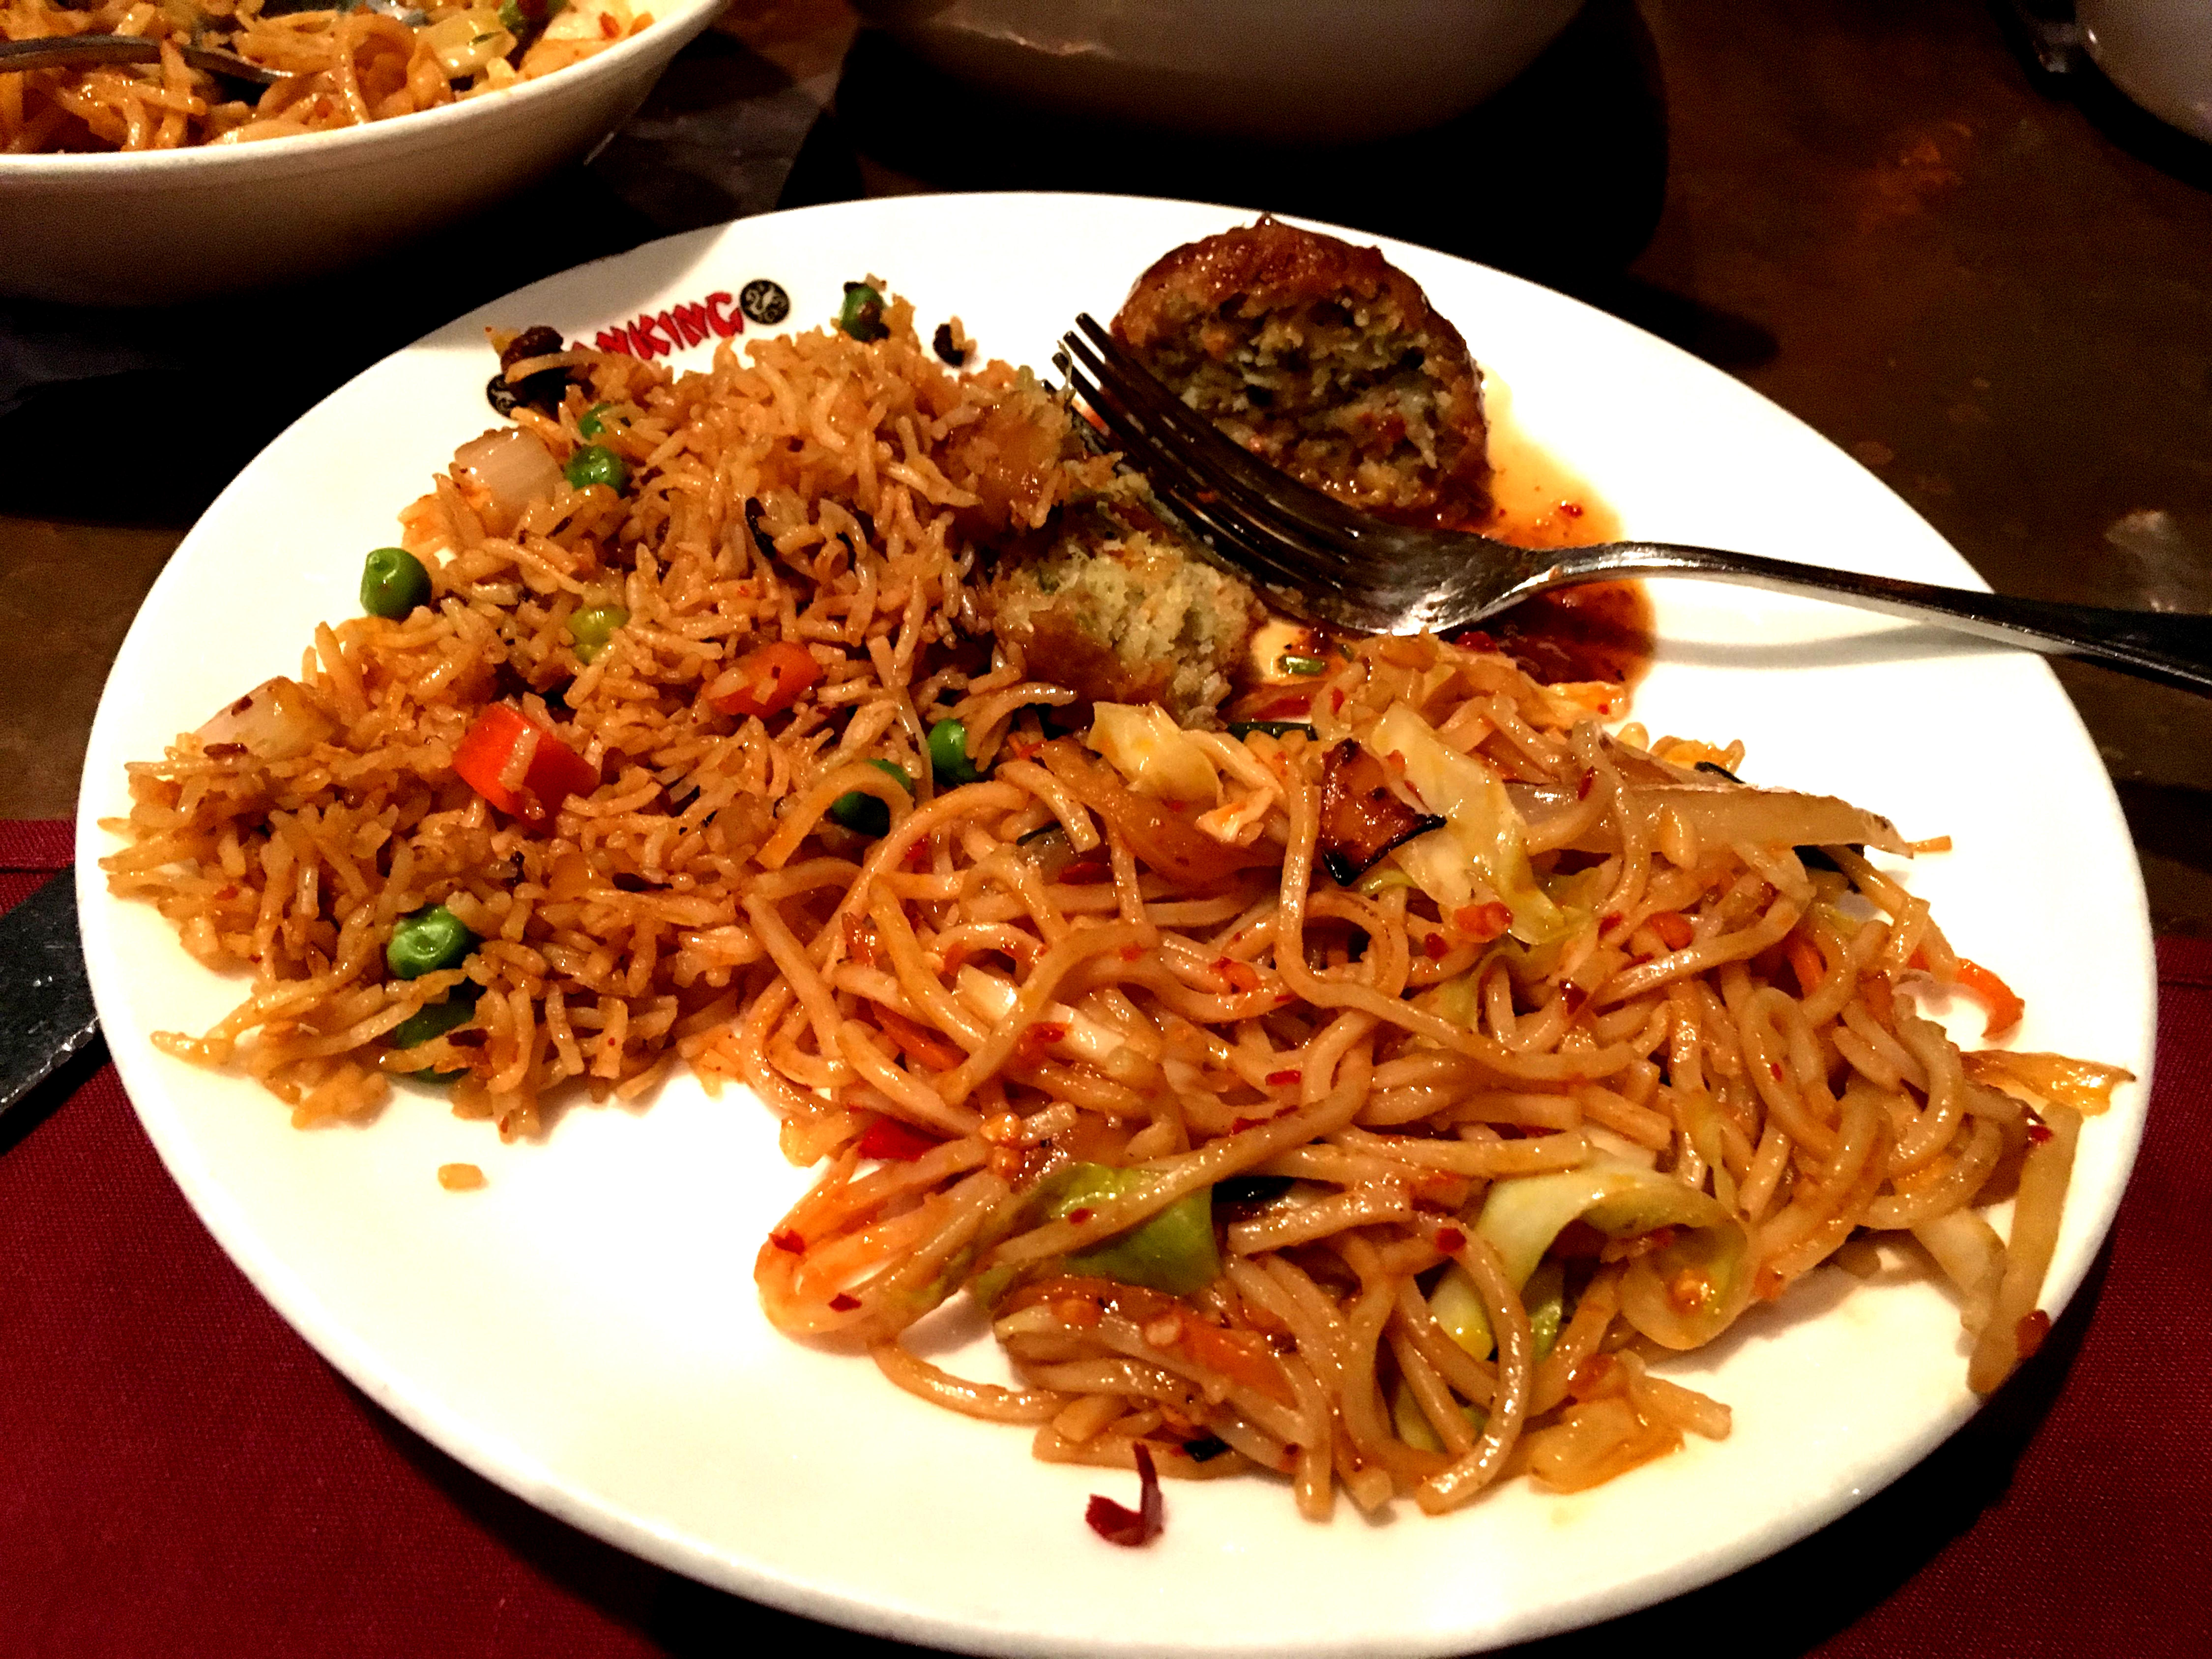 Free Images : dish, fried noodles, pad thai, ingredient